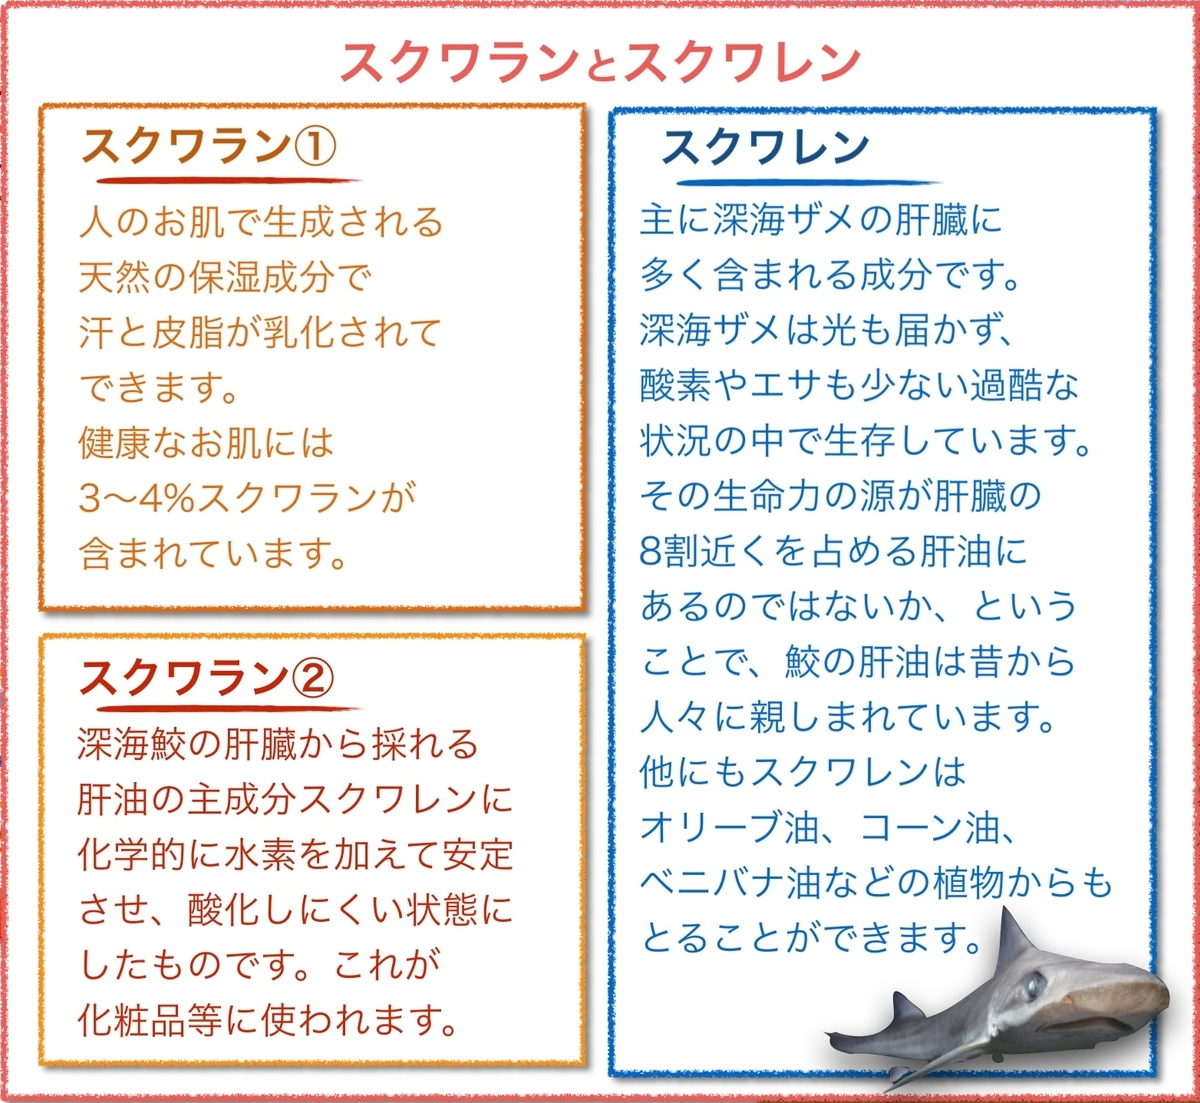 f:id:shirococco:20190526083335j:plain